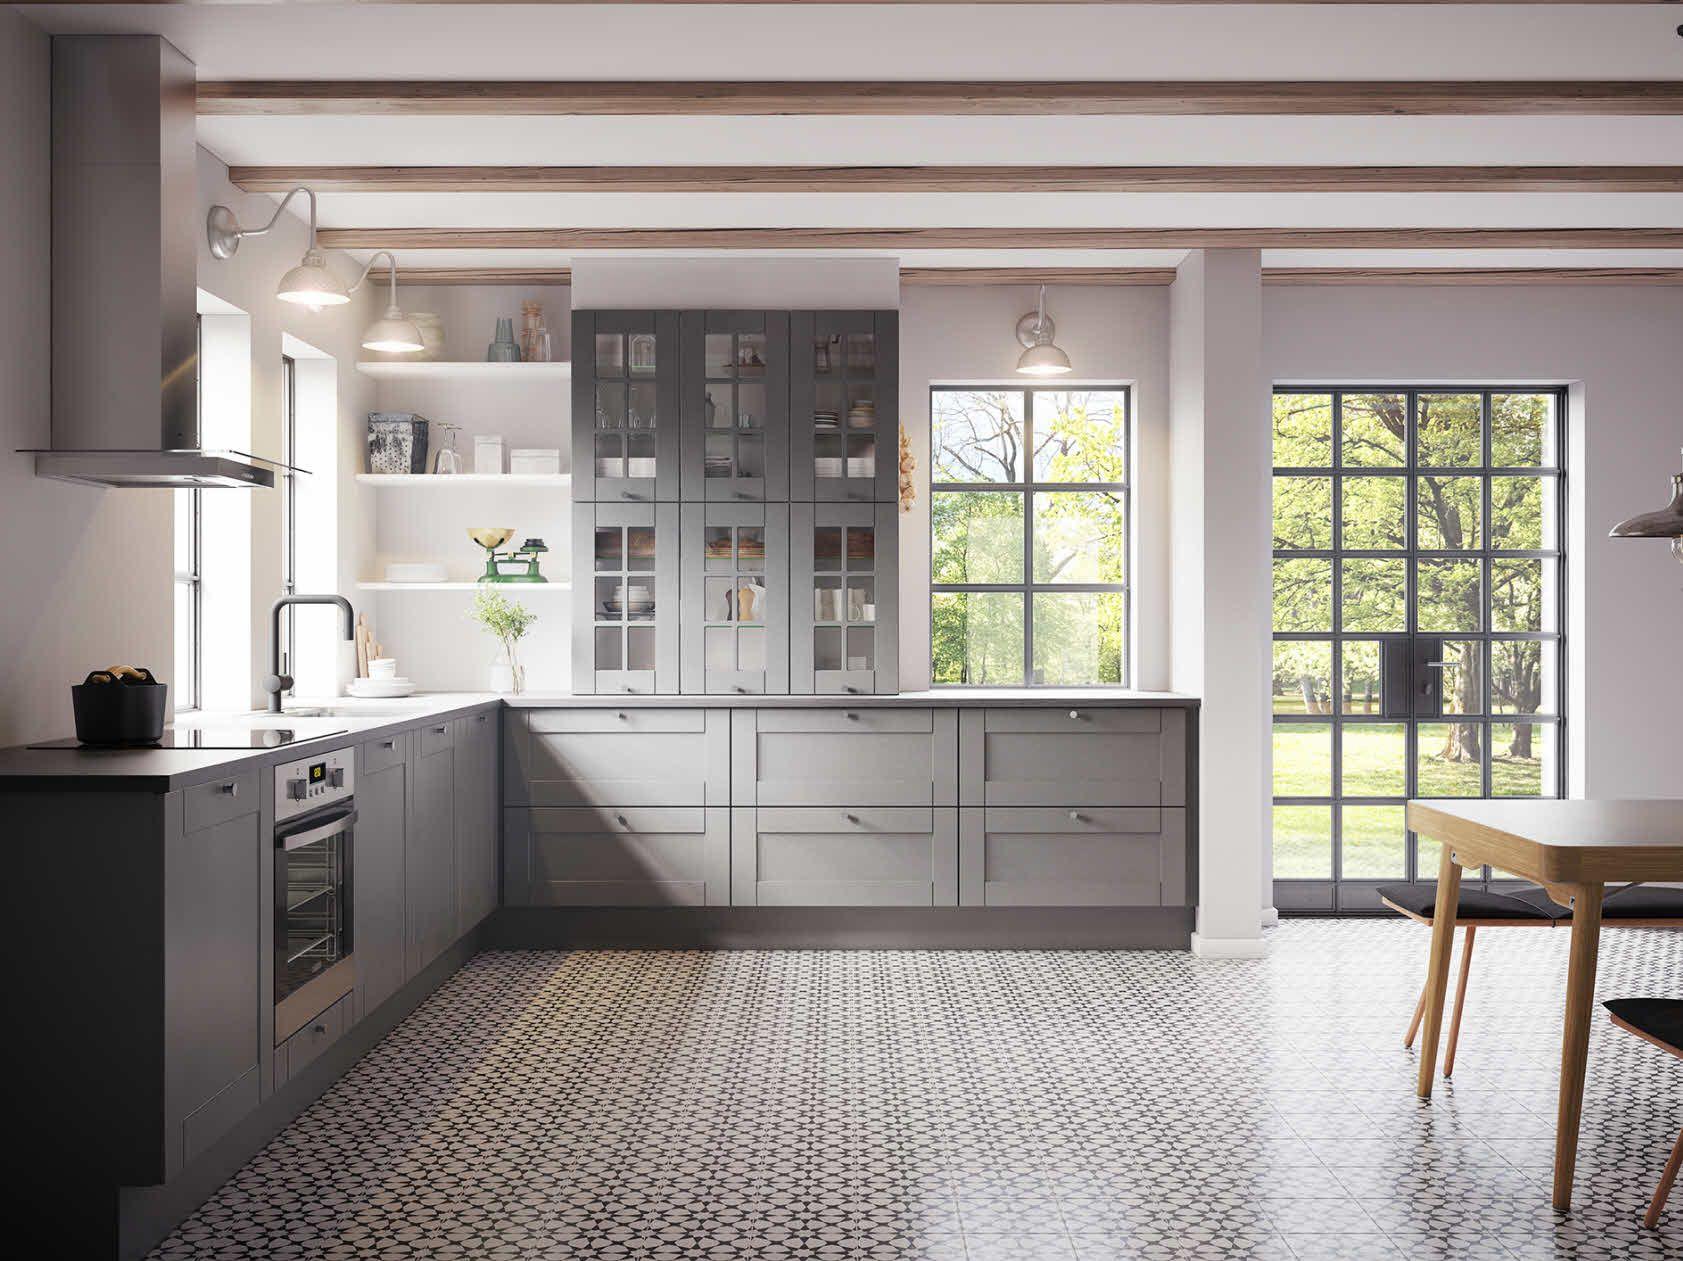 Kvik køkken grå kök kitchen ikea kitchen and grey